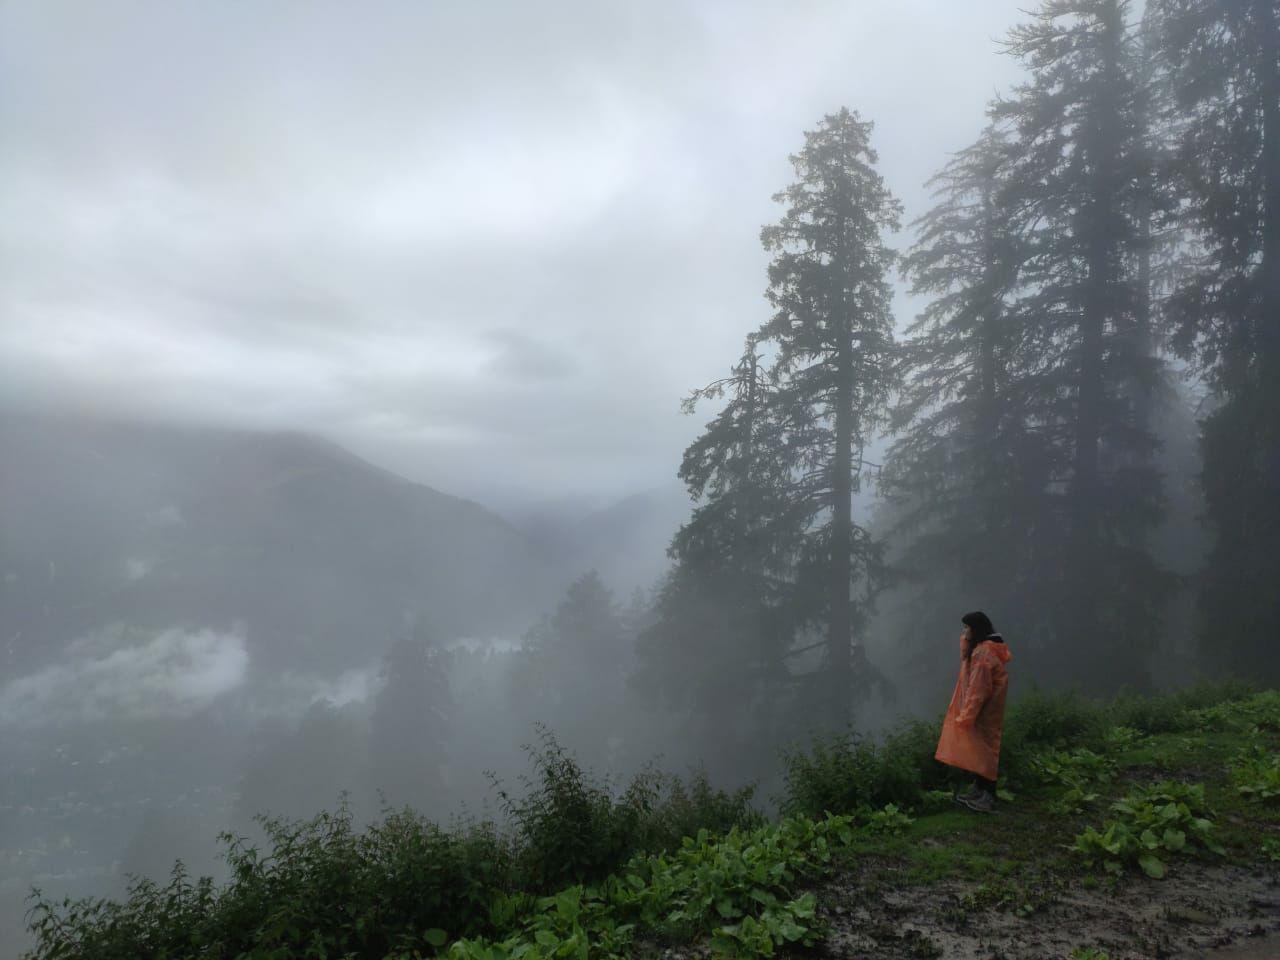 Photo of Balu Ka Ghera Campsite By Shruti Das